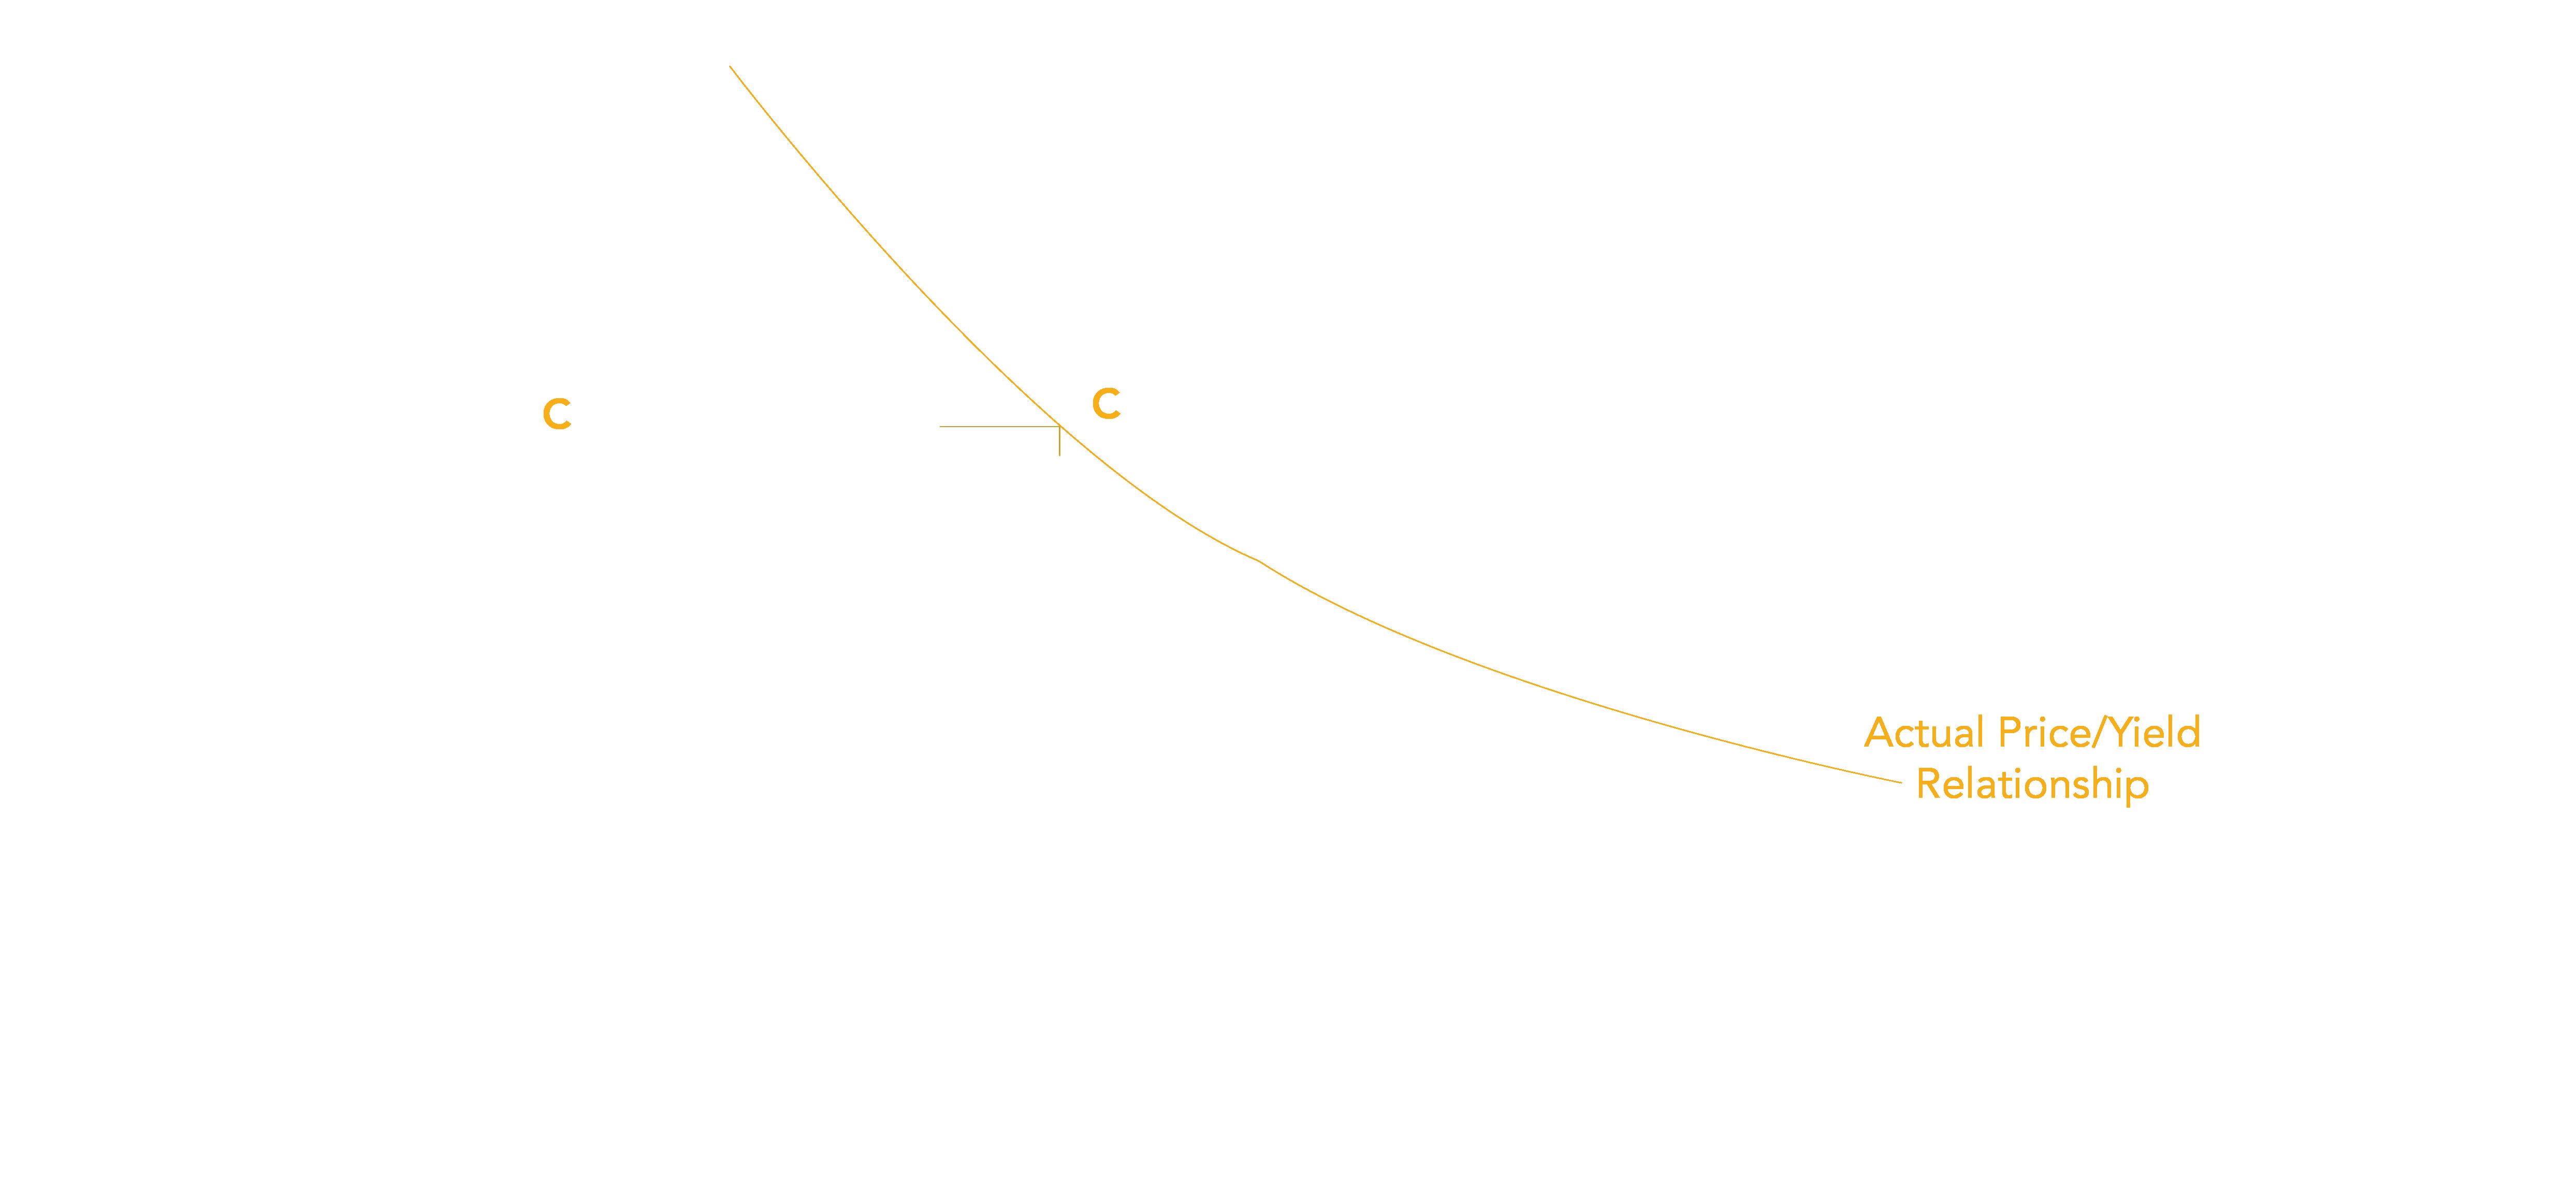 Bond Price Reacts